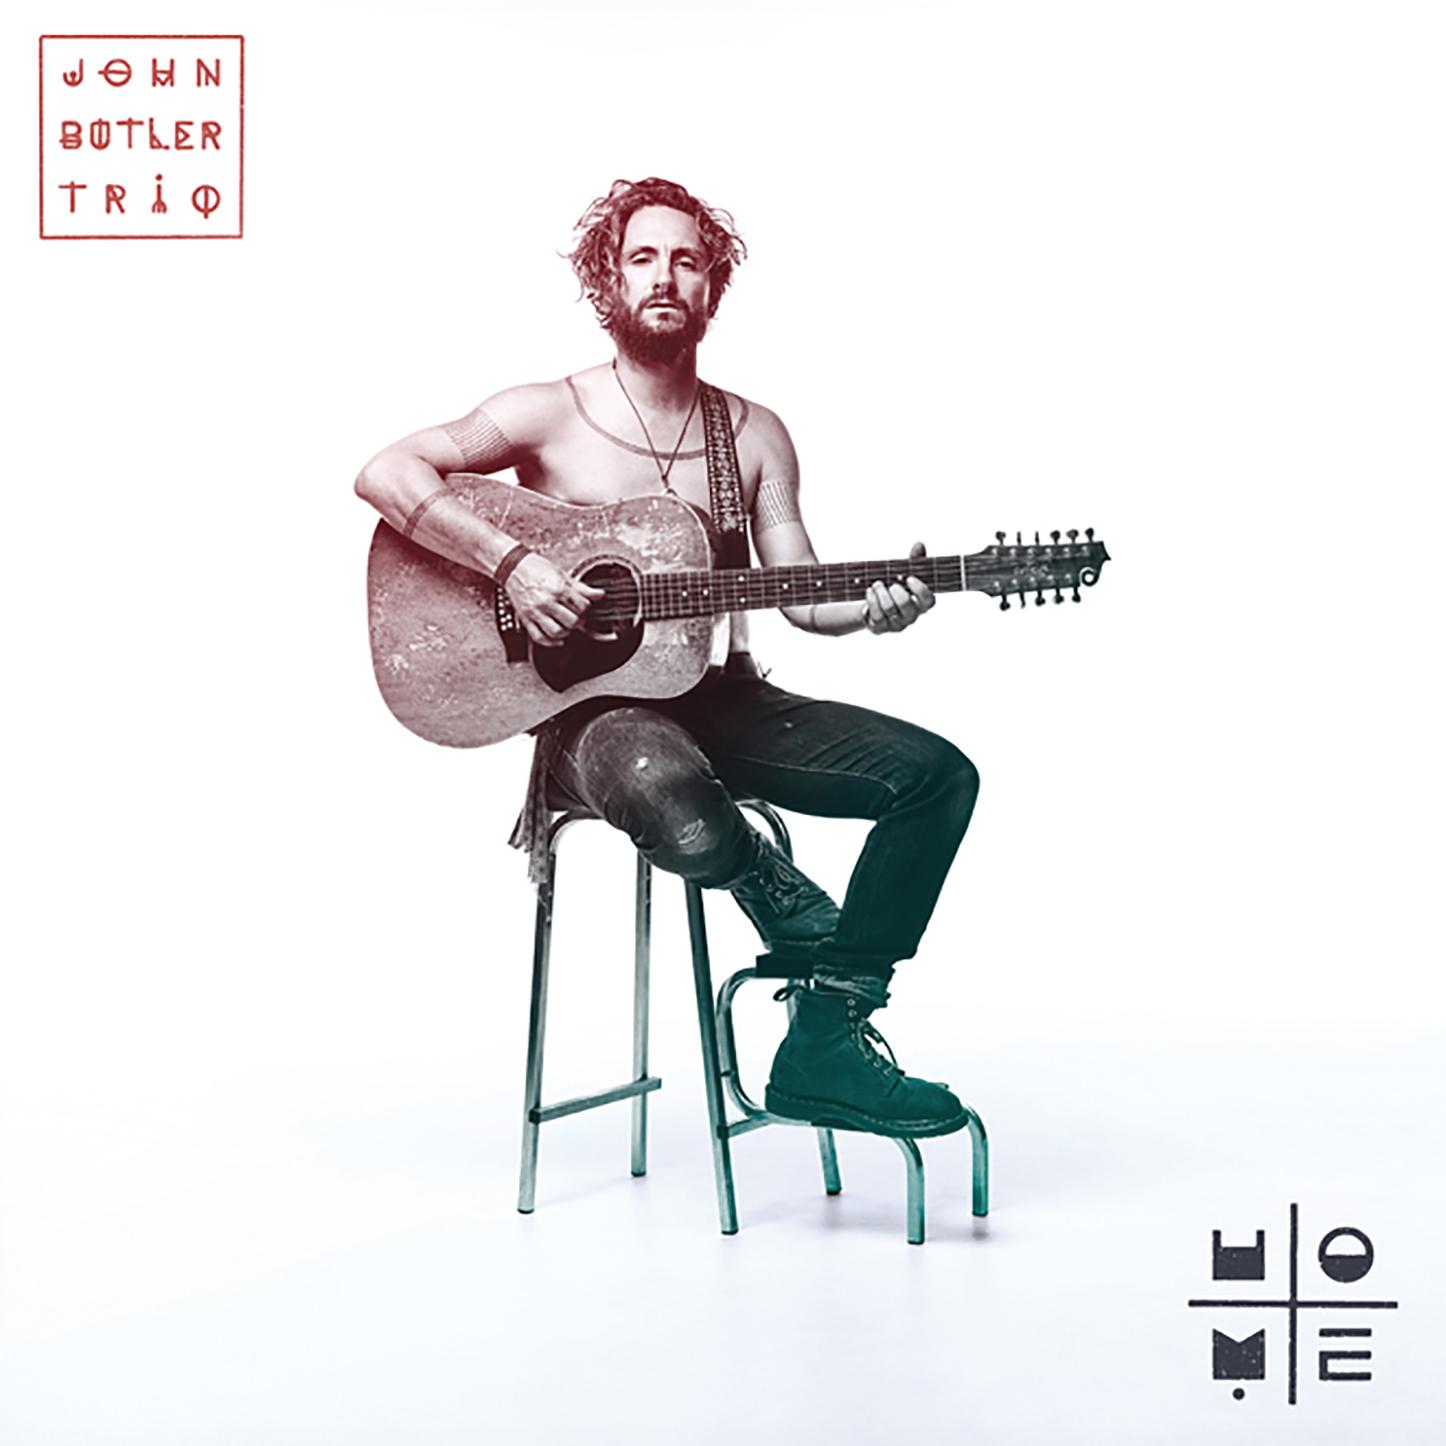 「HOME」収録アルバム『HOME』/JOHN BUTLER TRIO +